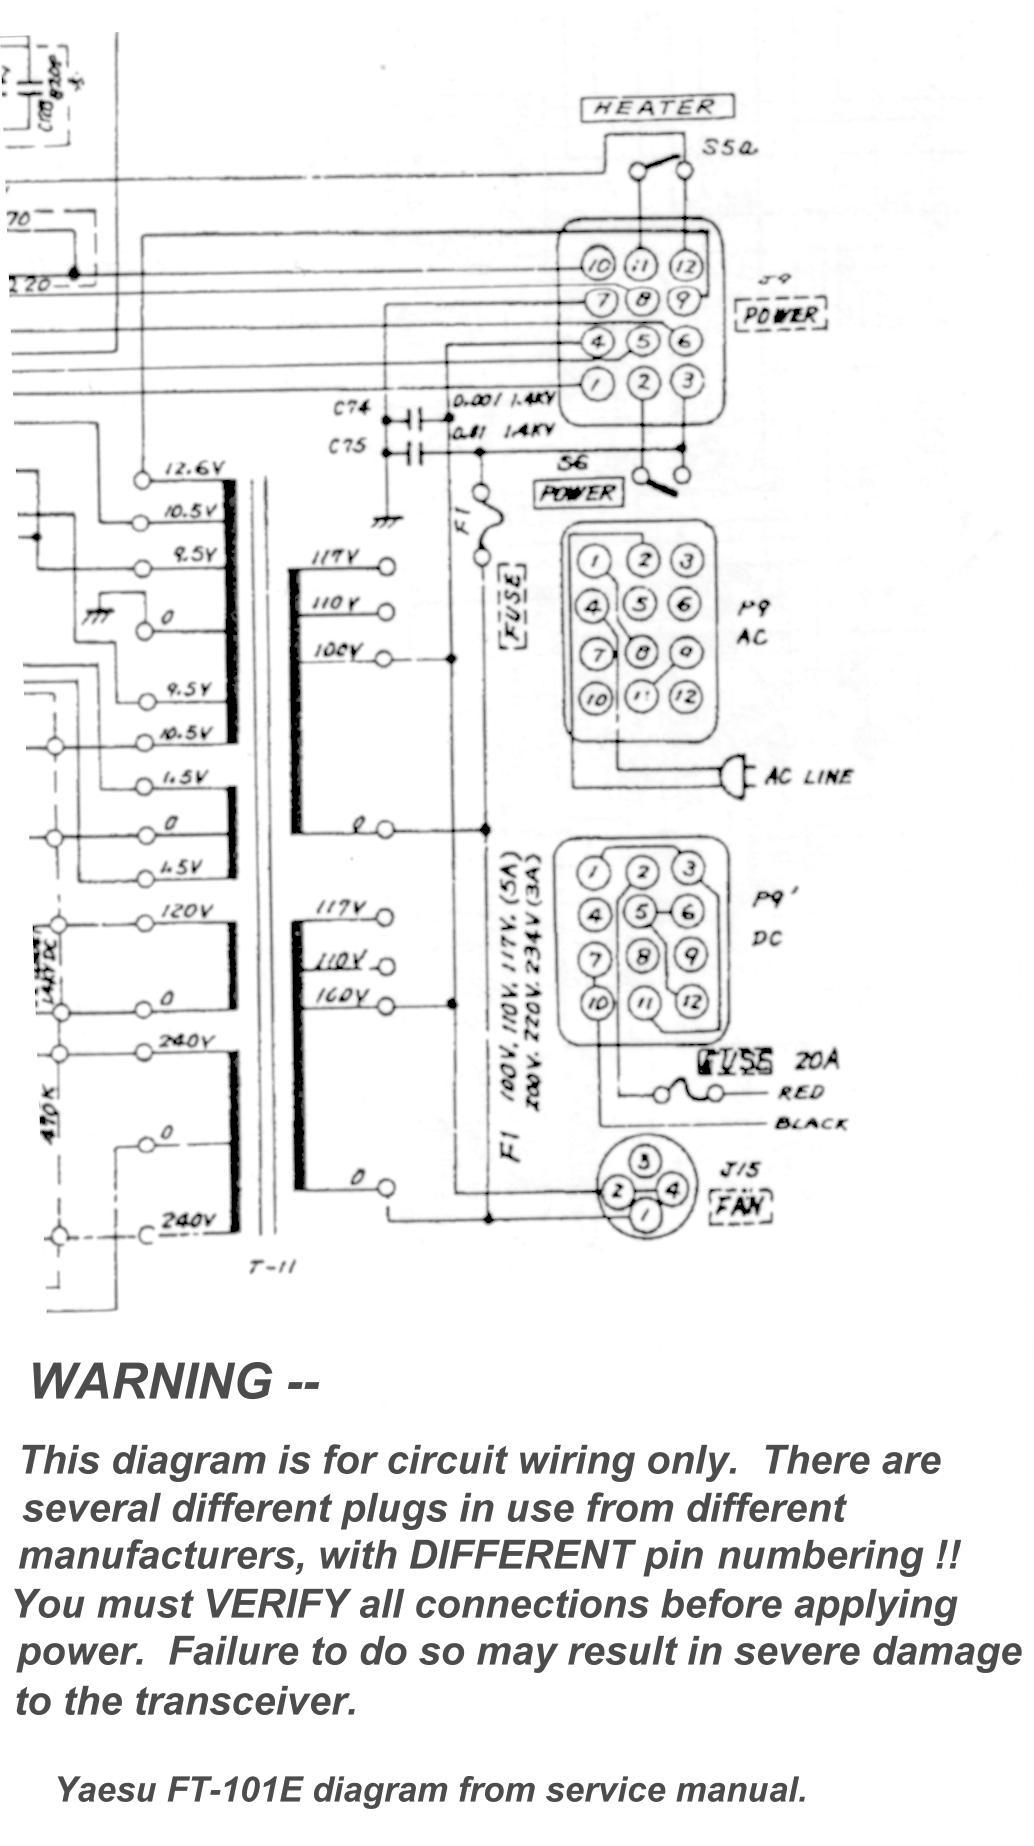 3 Prong Cord Diagram